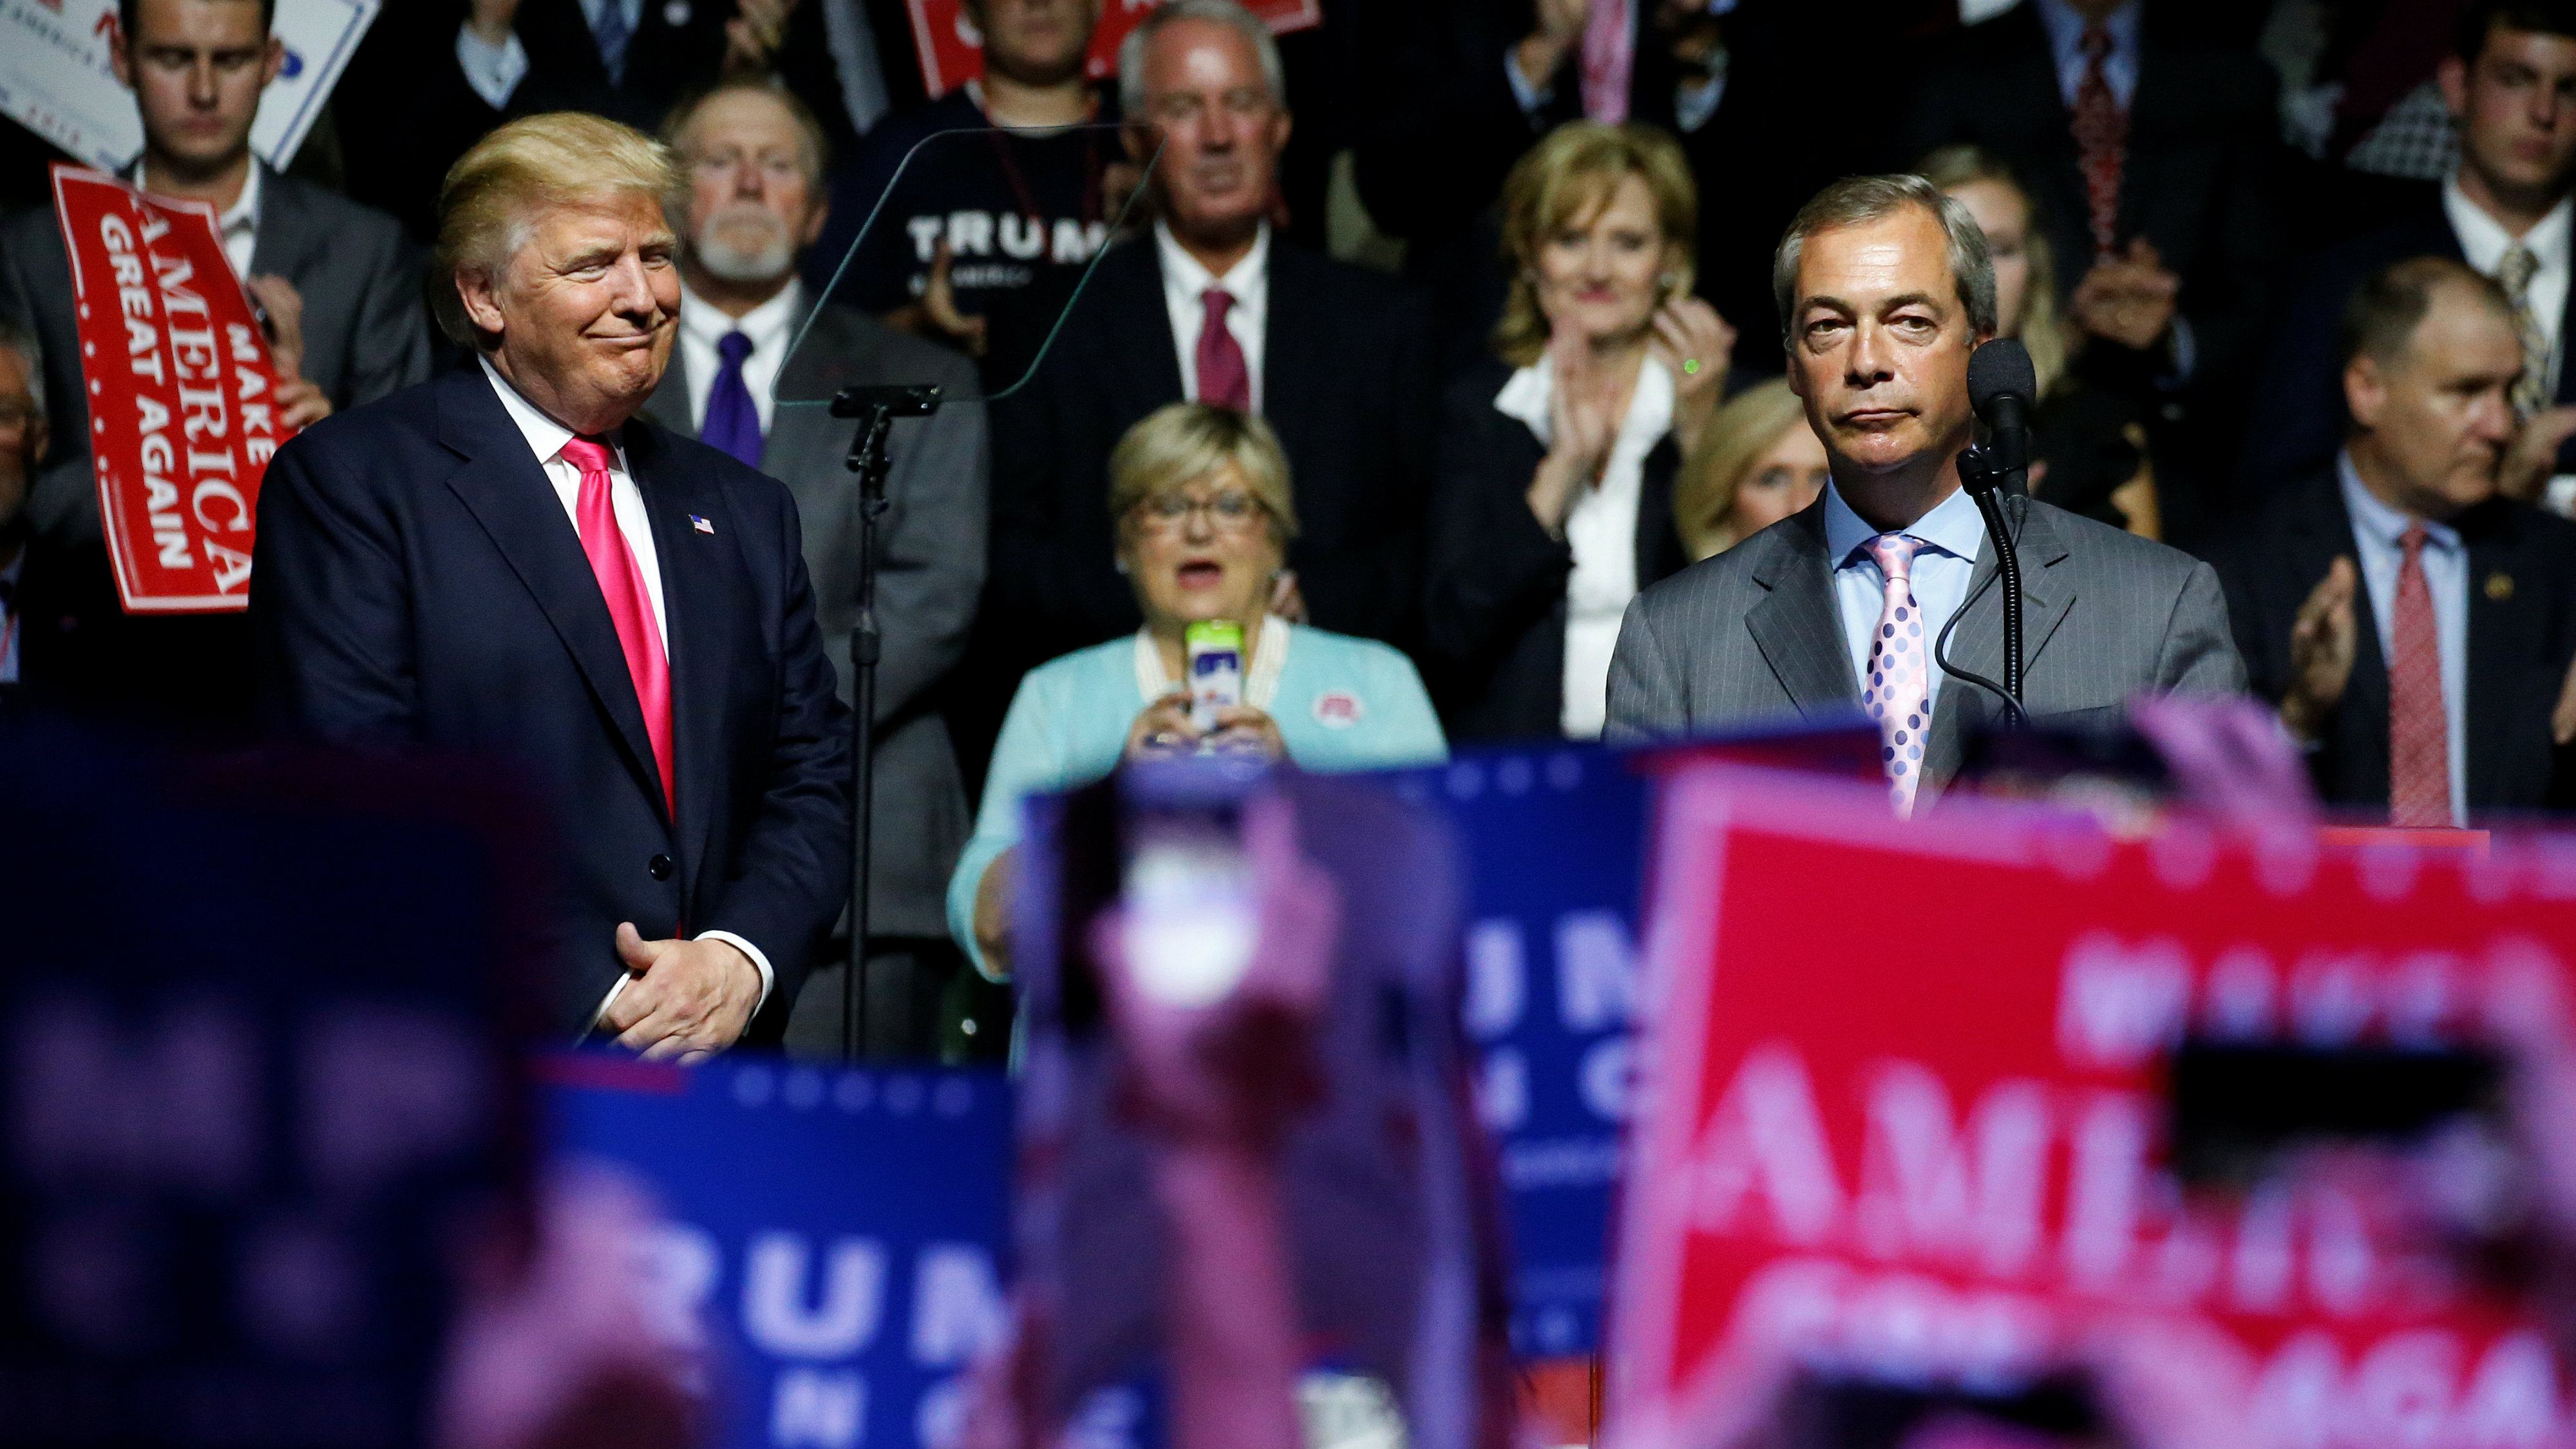 Farage-Trump